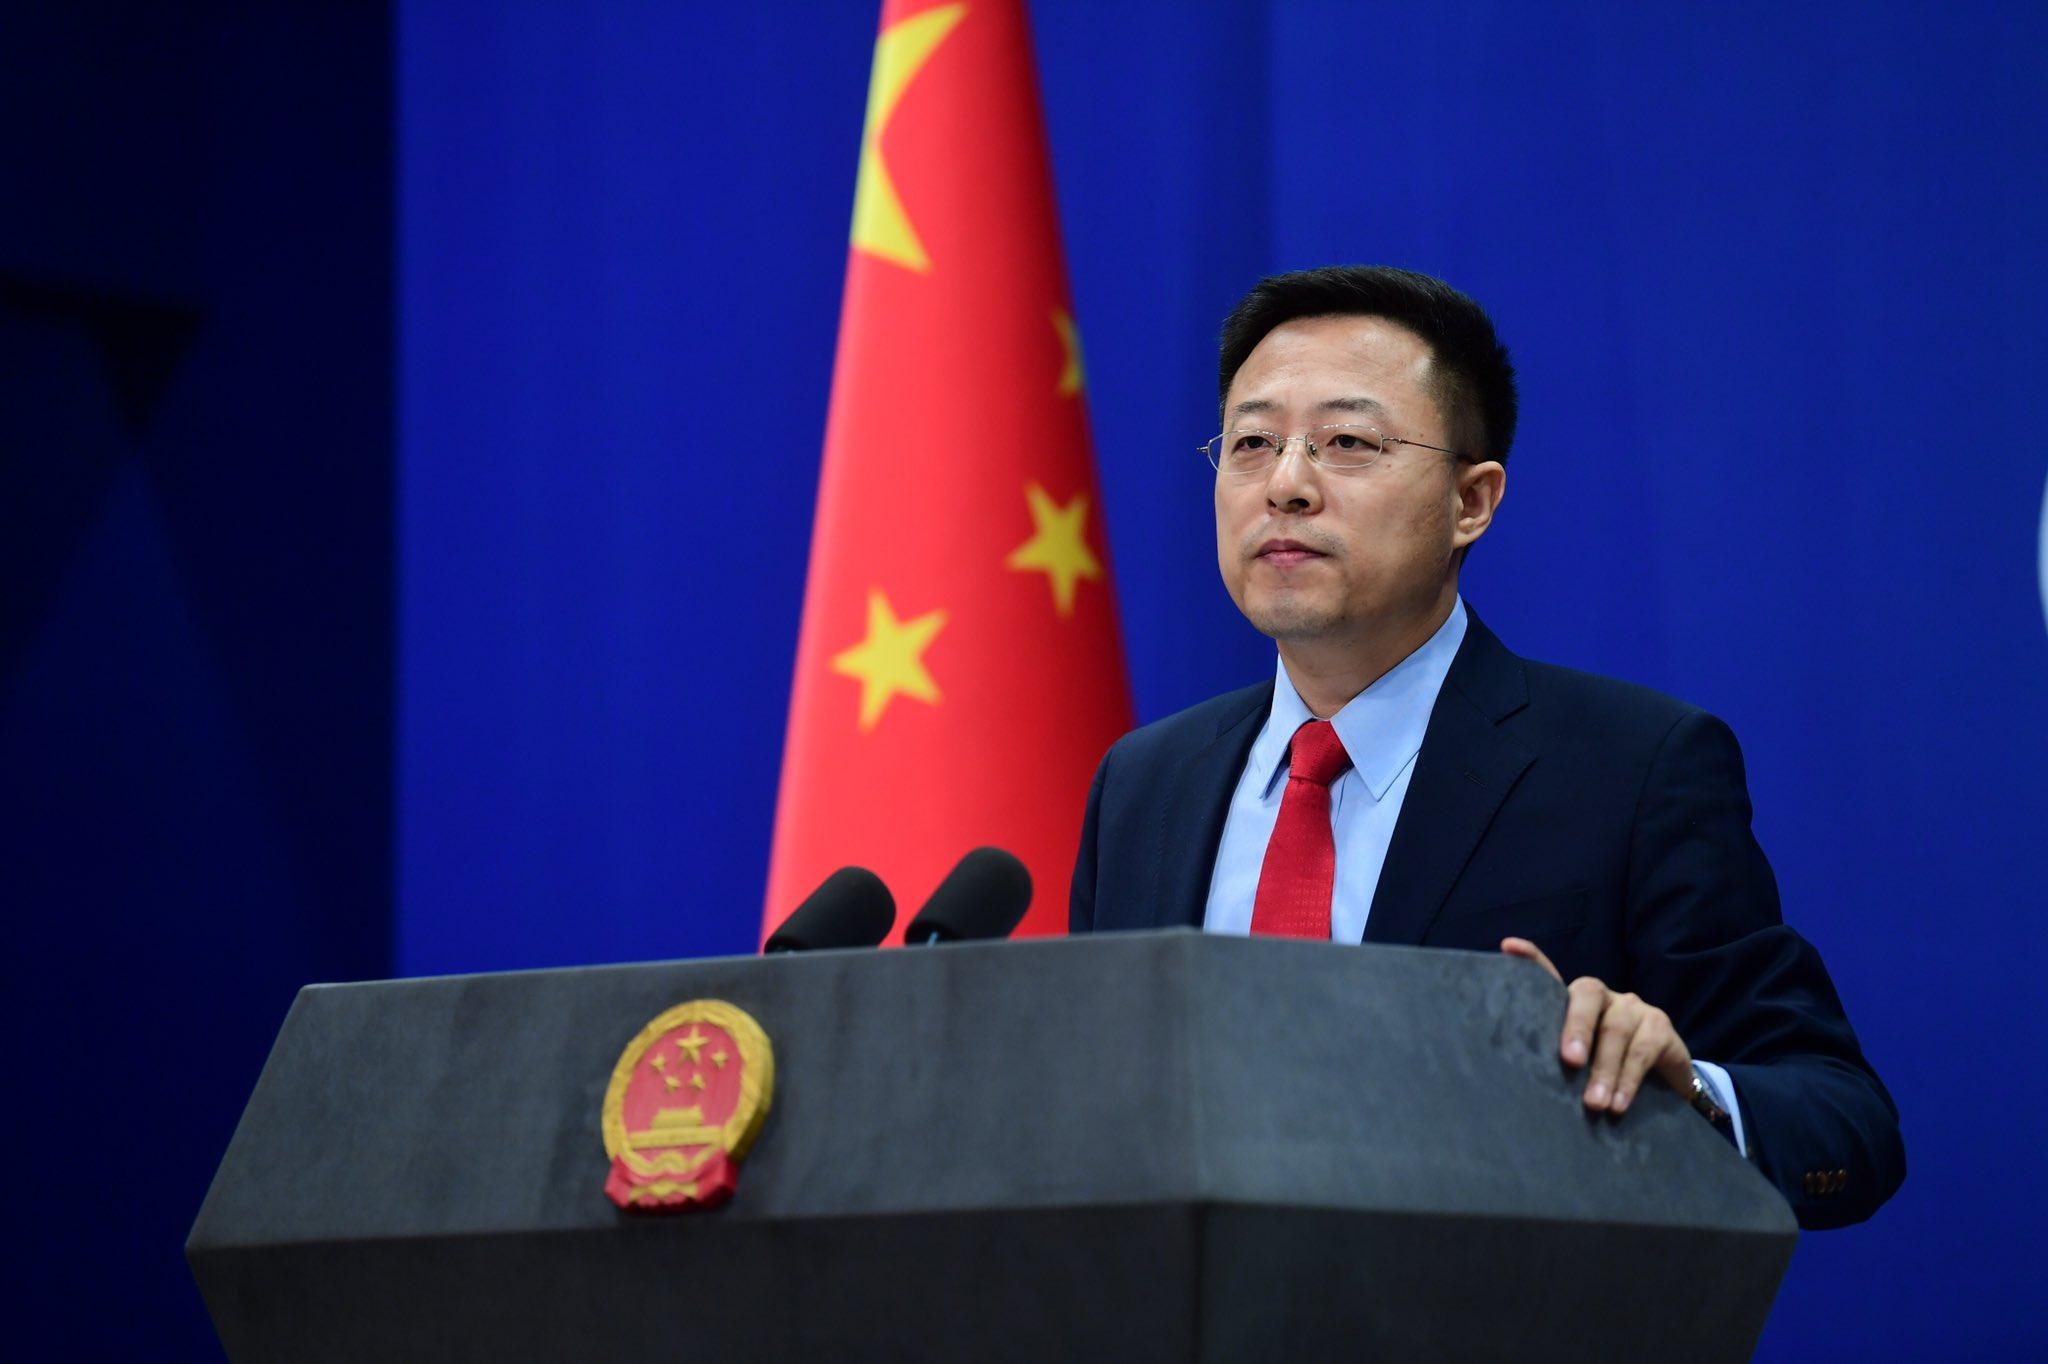 China questions Canada's motive for the arrest of Huawei CFO Meng Wanzhou